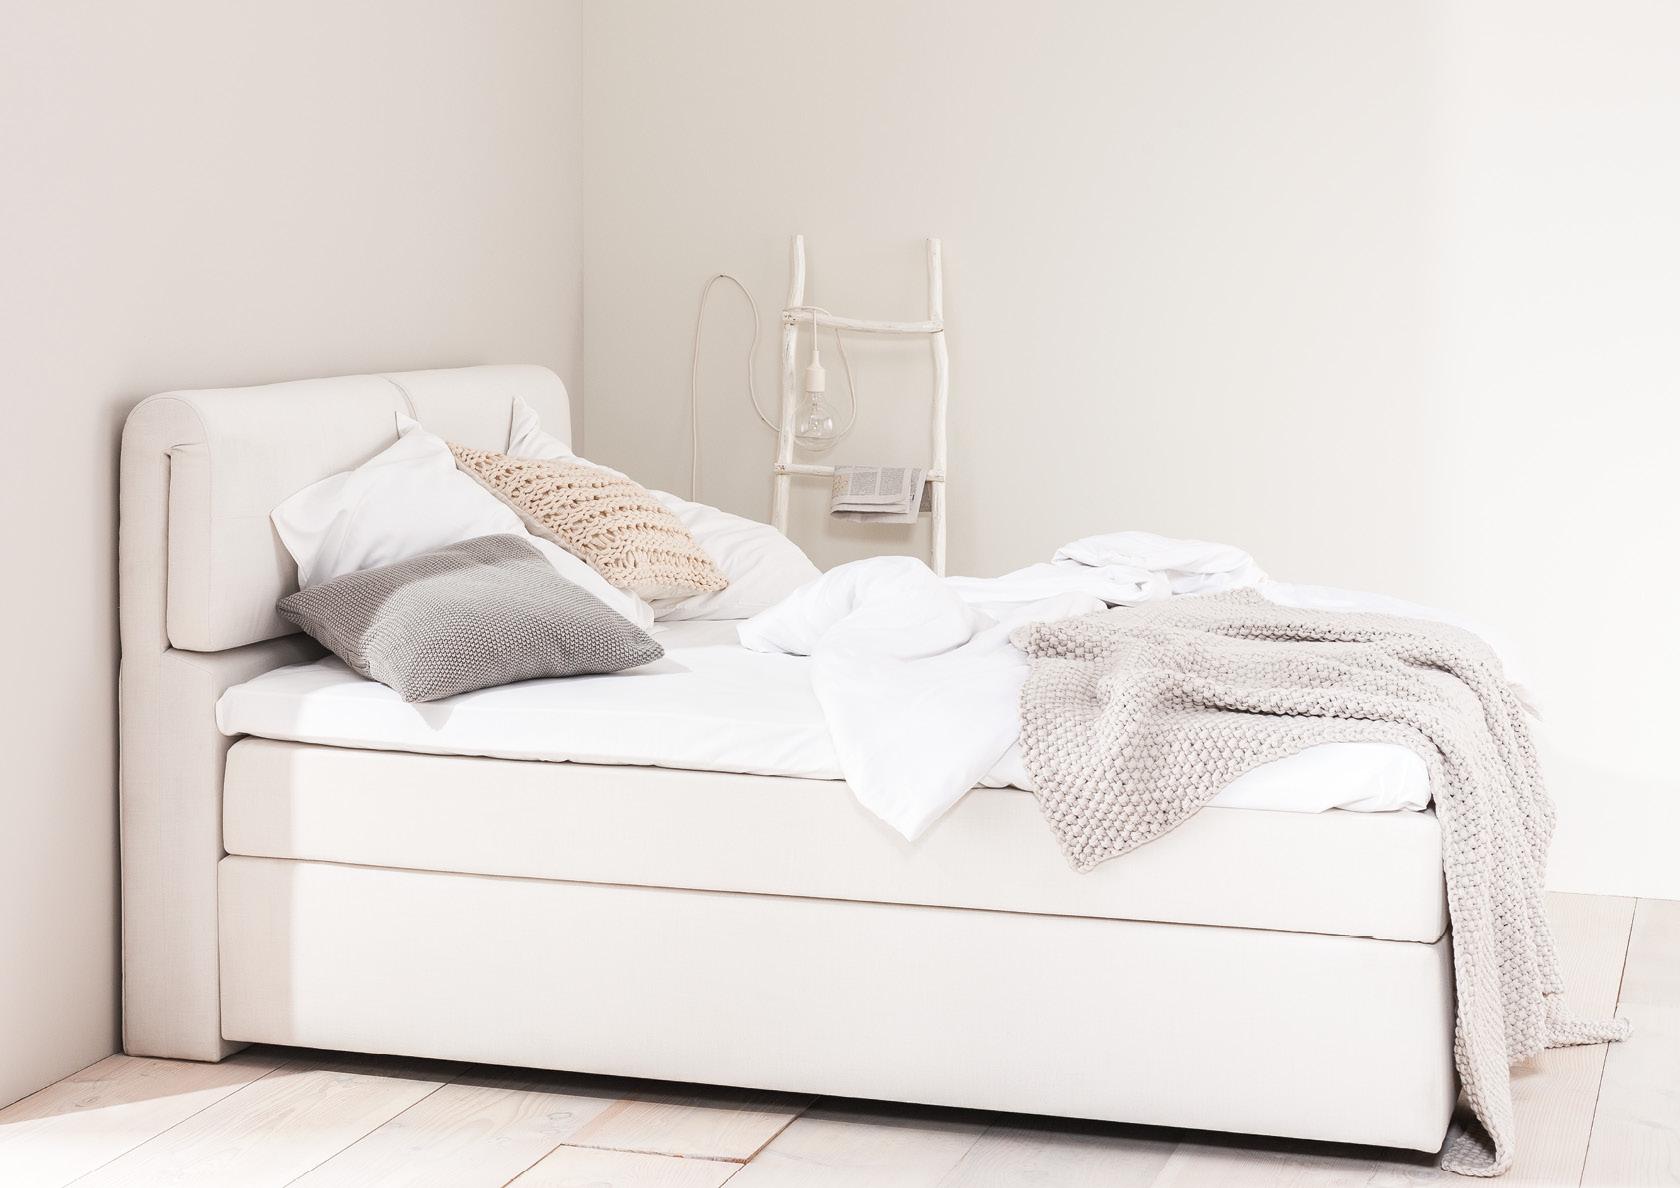 schlafsysteme m bel becher inh peter wei in morsbach. Black Bedroom Furniture Sets. Home Design Ideas